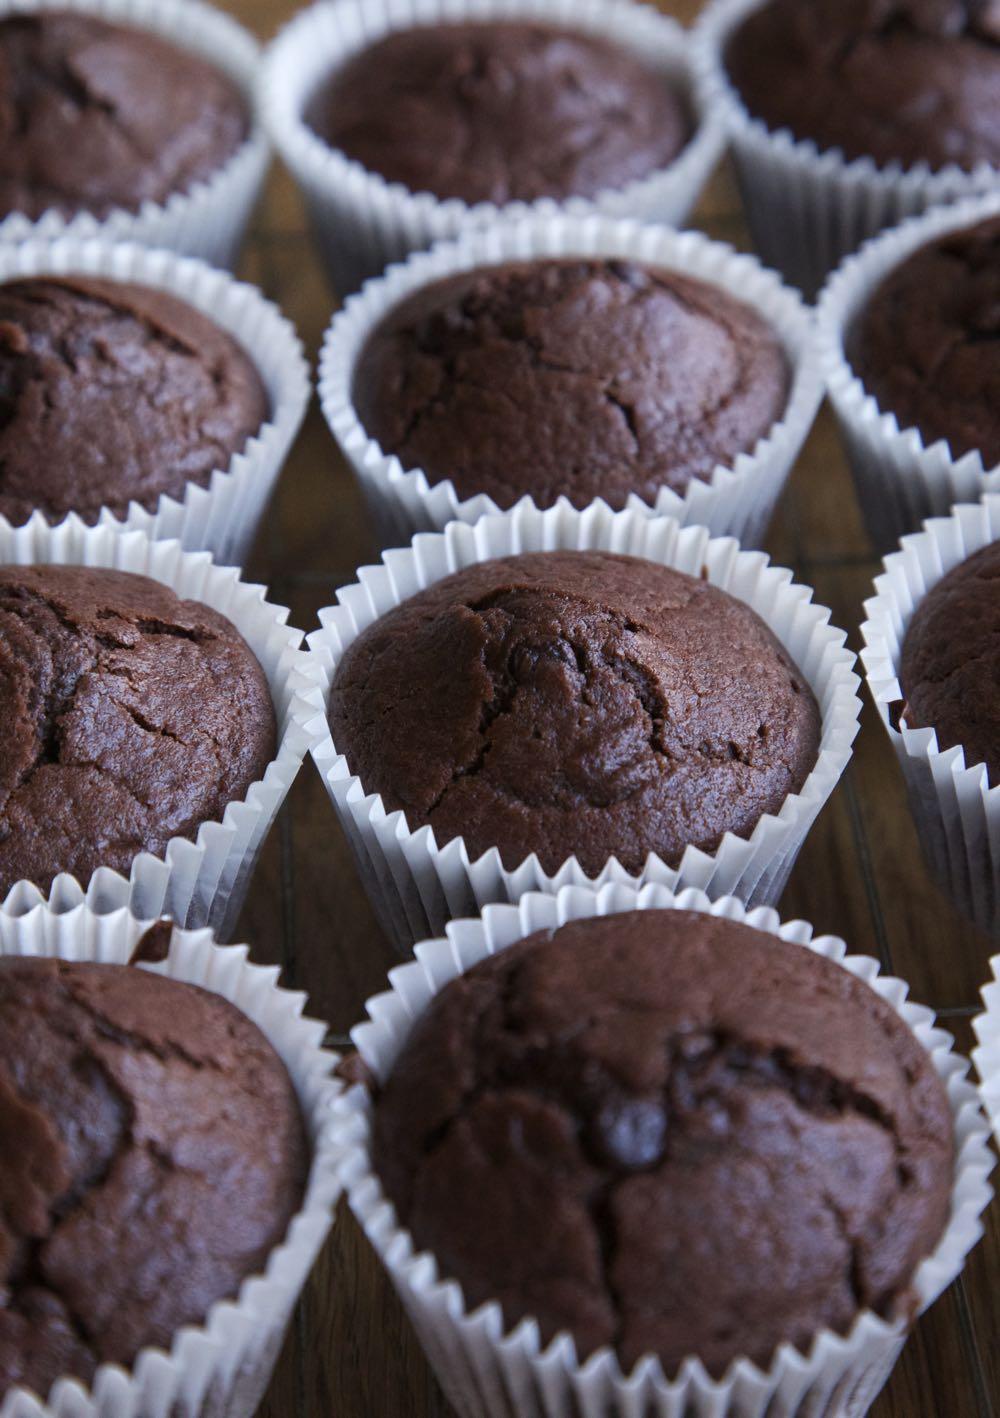 Rows of Chocolate Orange Muffins.